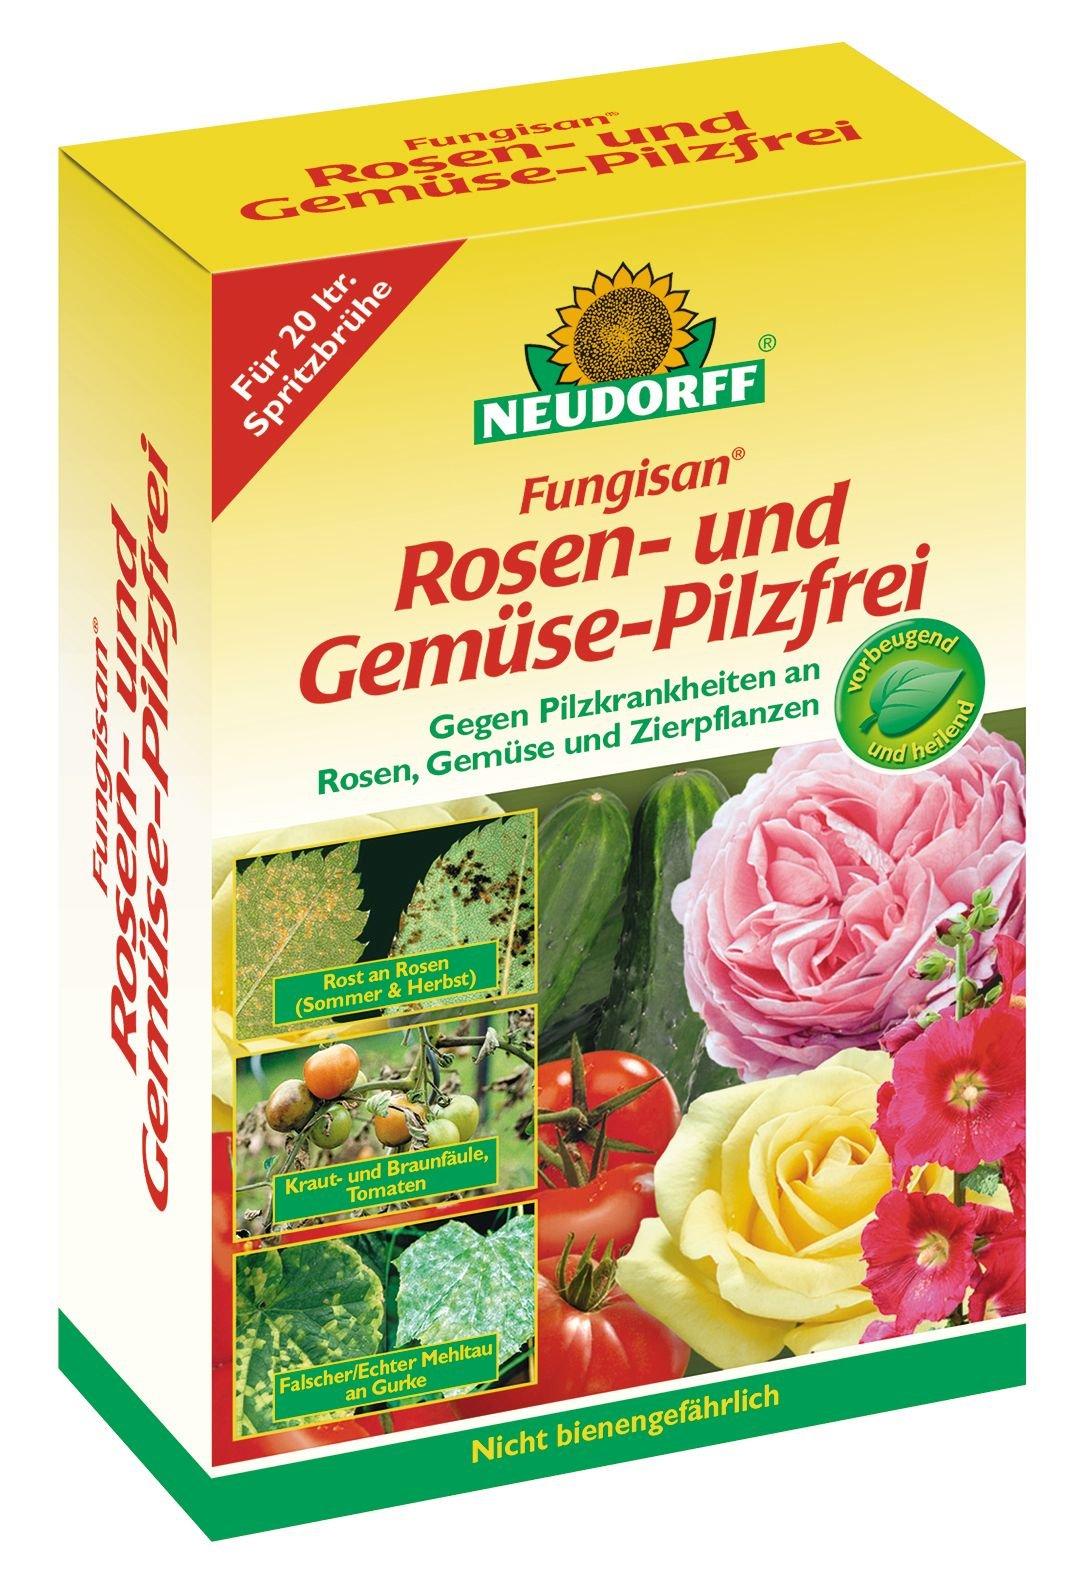 Neudorff 448 Fungisan Rosen und Gemüse Pilzfrei, 16 ml product image